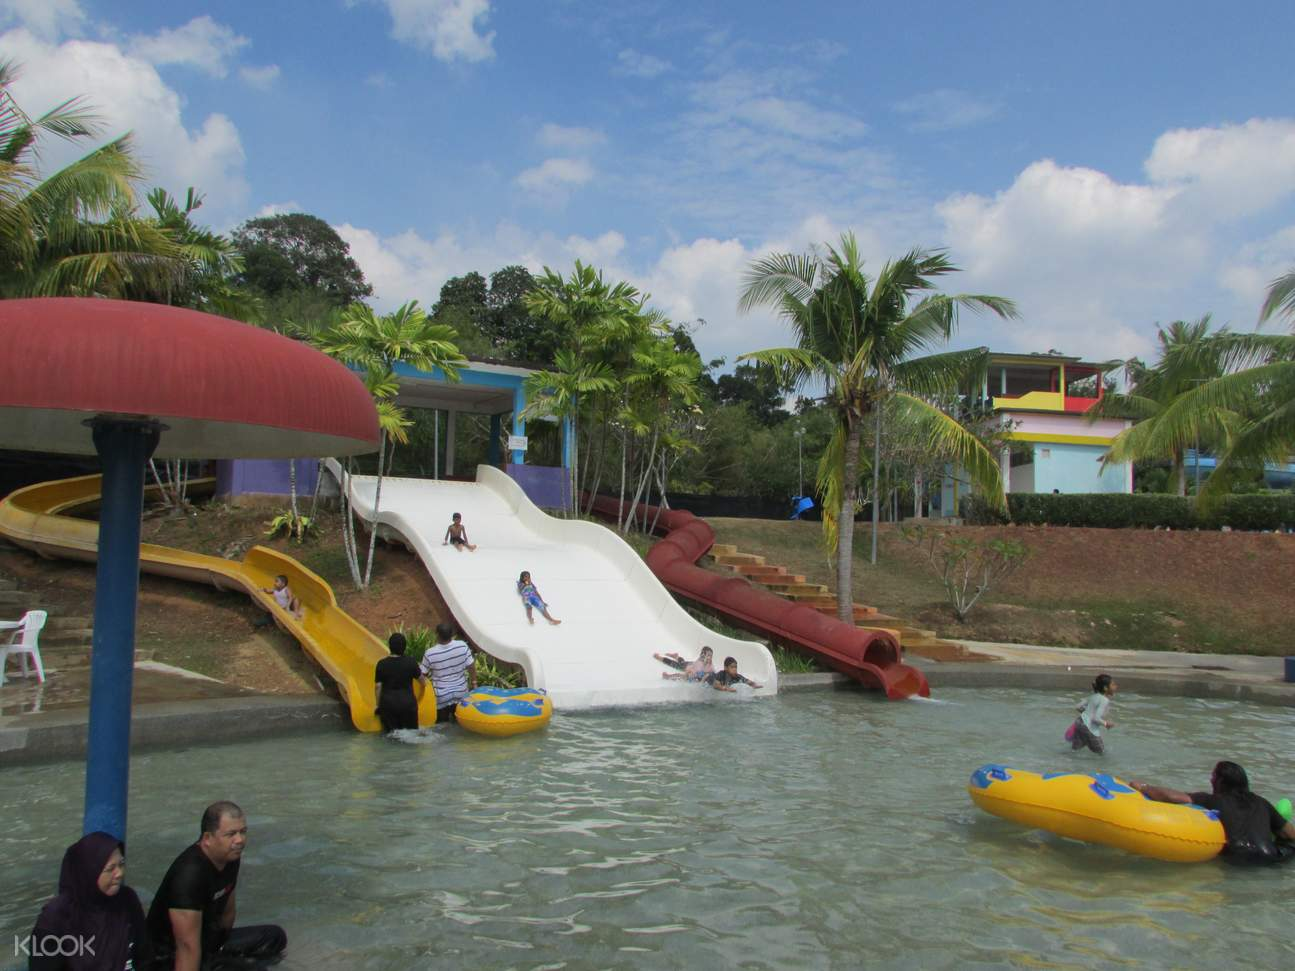 people on floaties